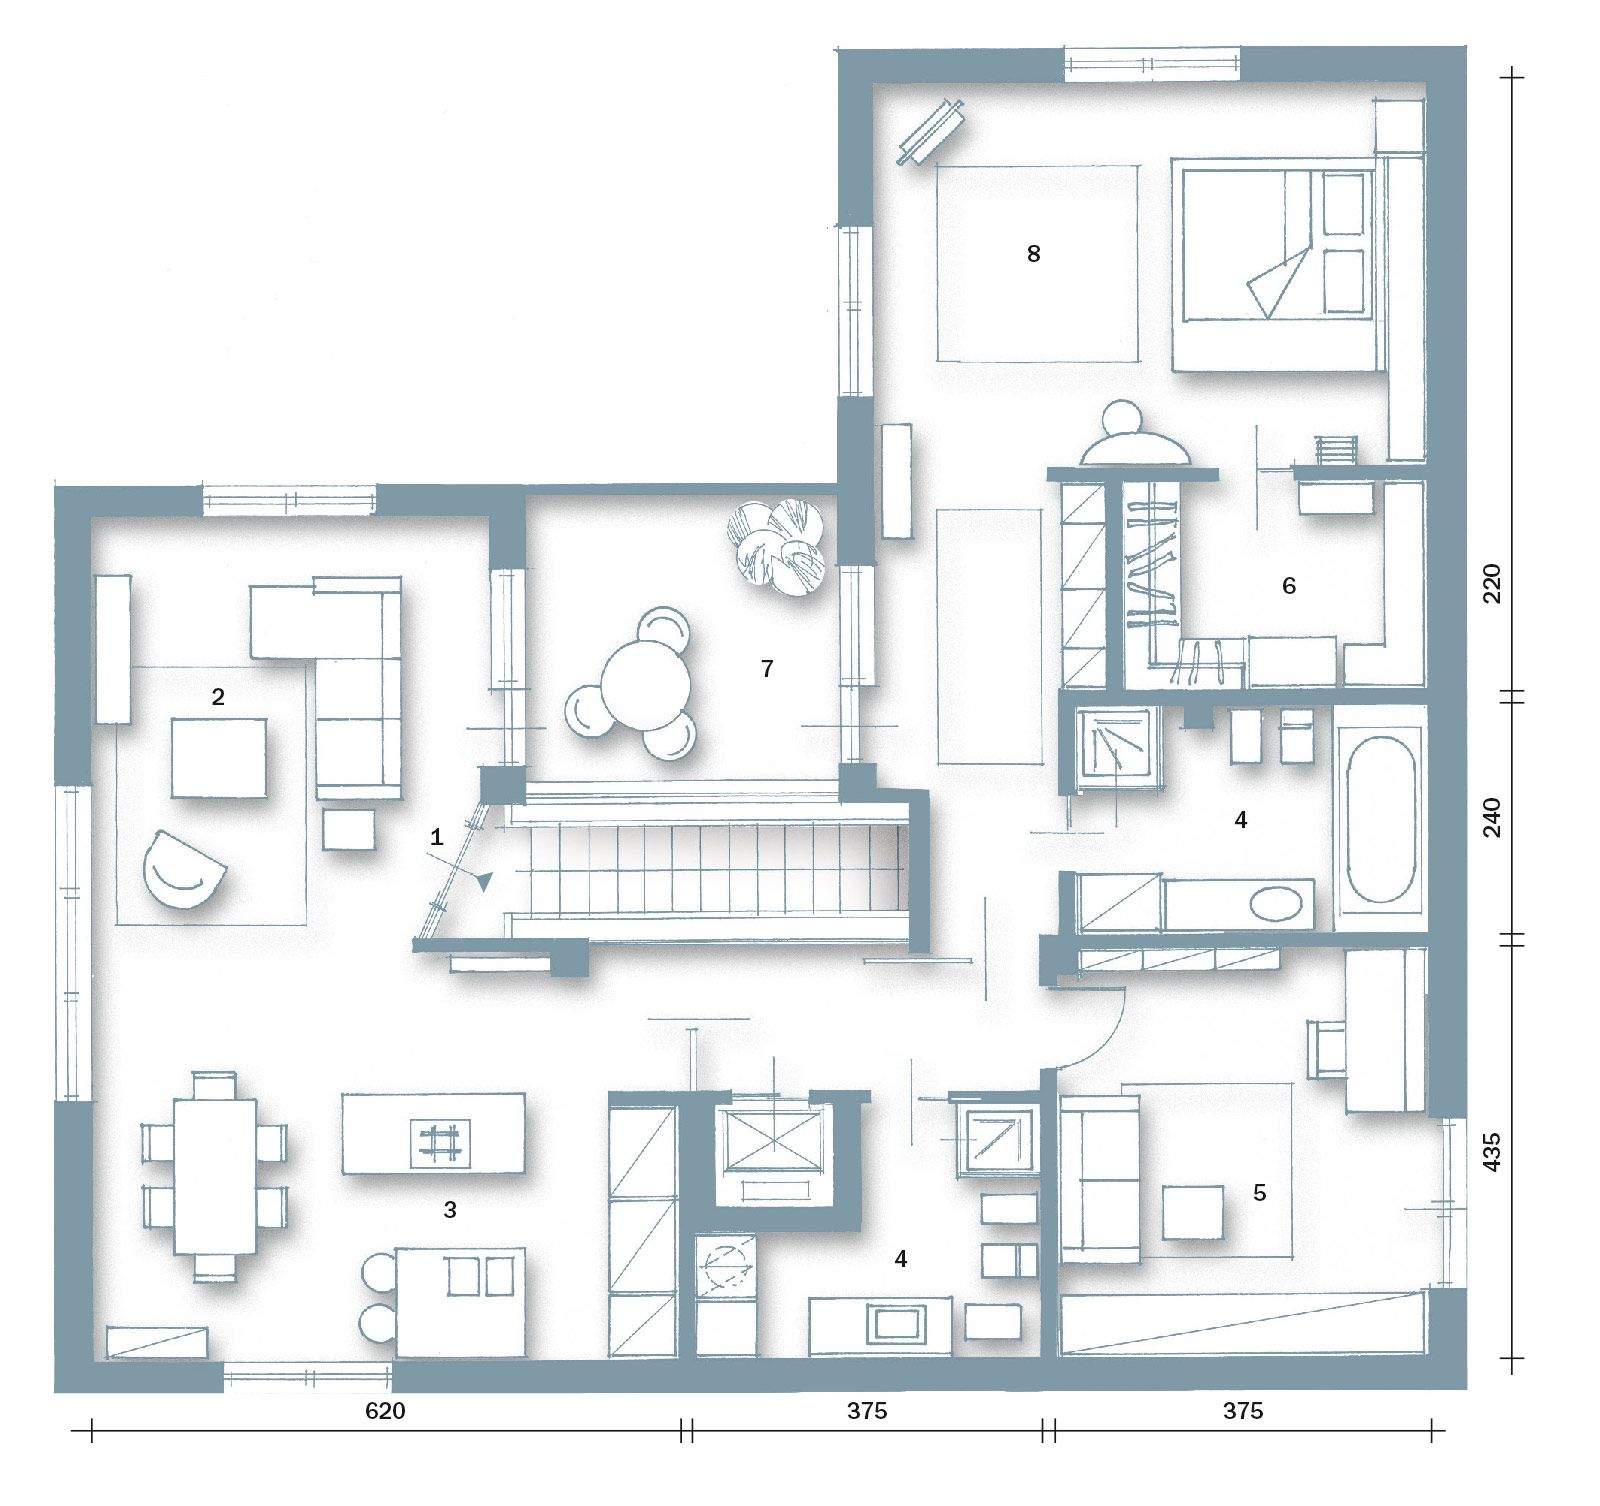 Pianta casa 1600 1506 architettura pinterest for Pianta casa 70 mq